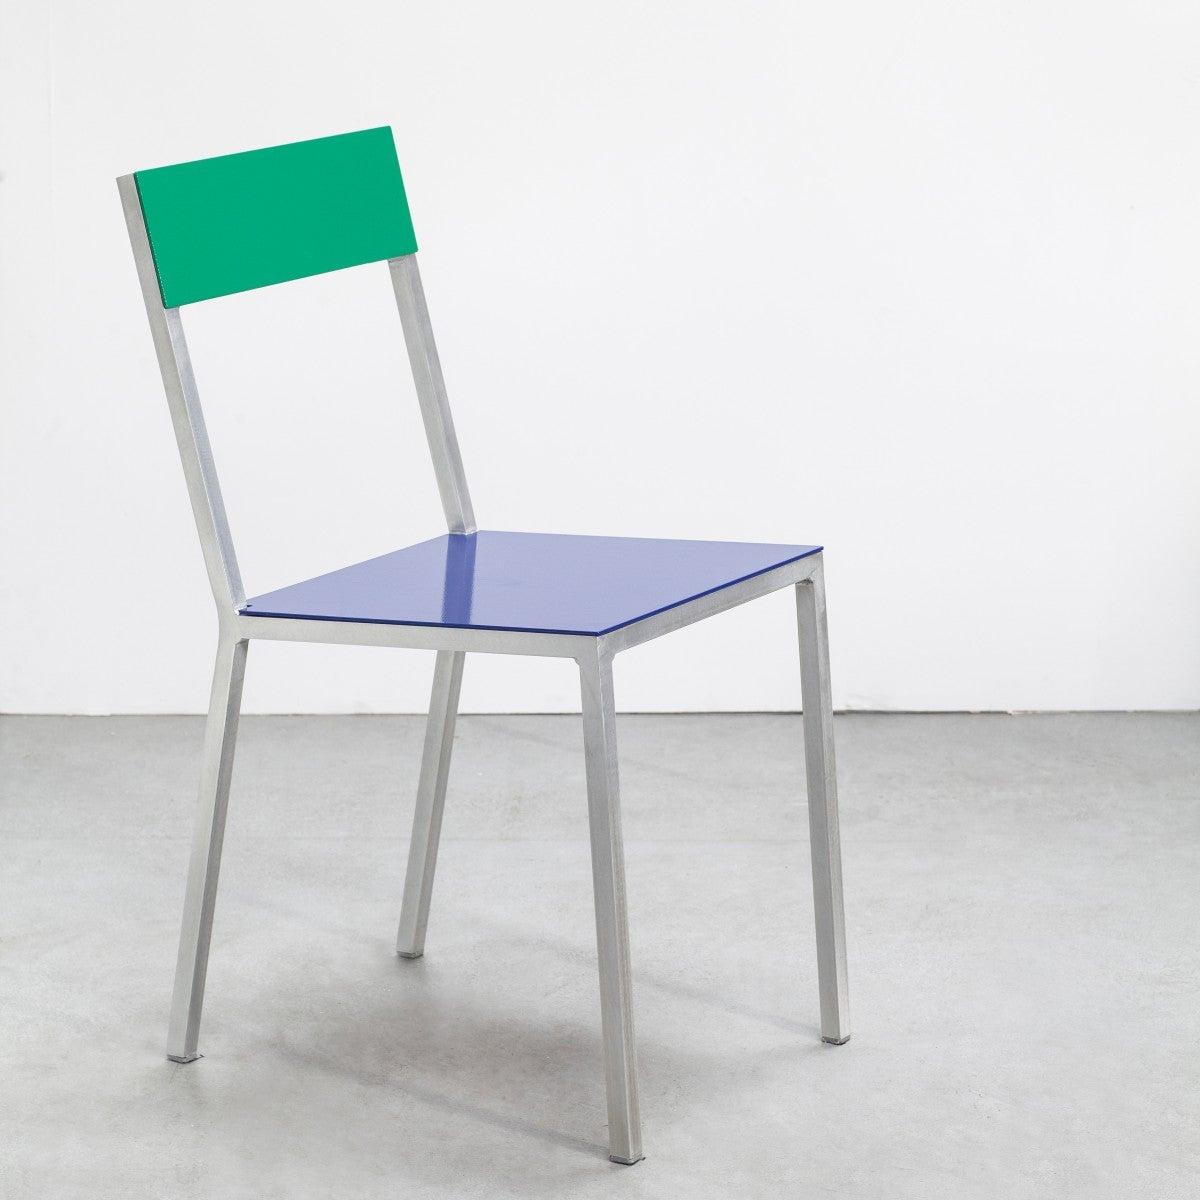 alu-chair-blue-green